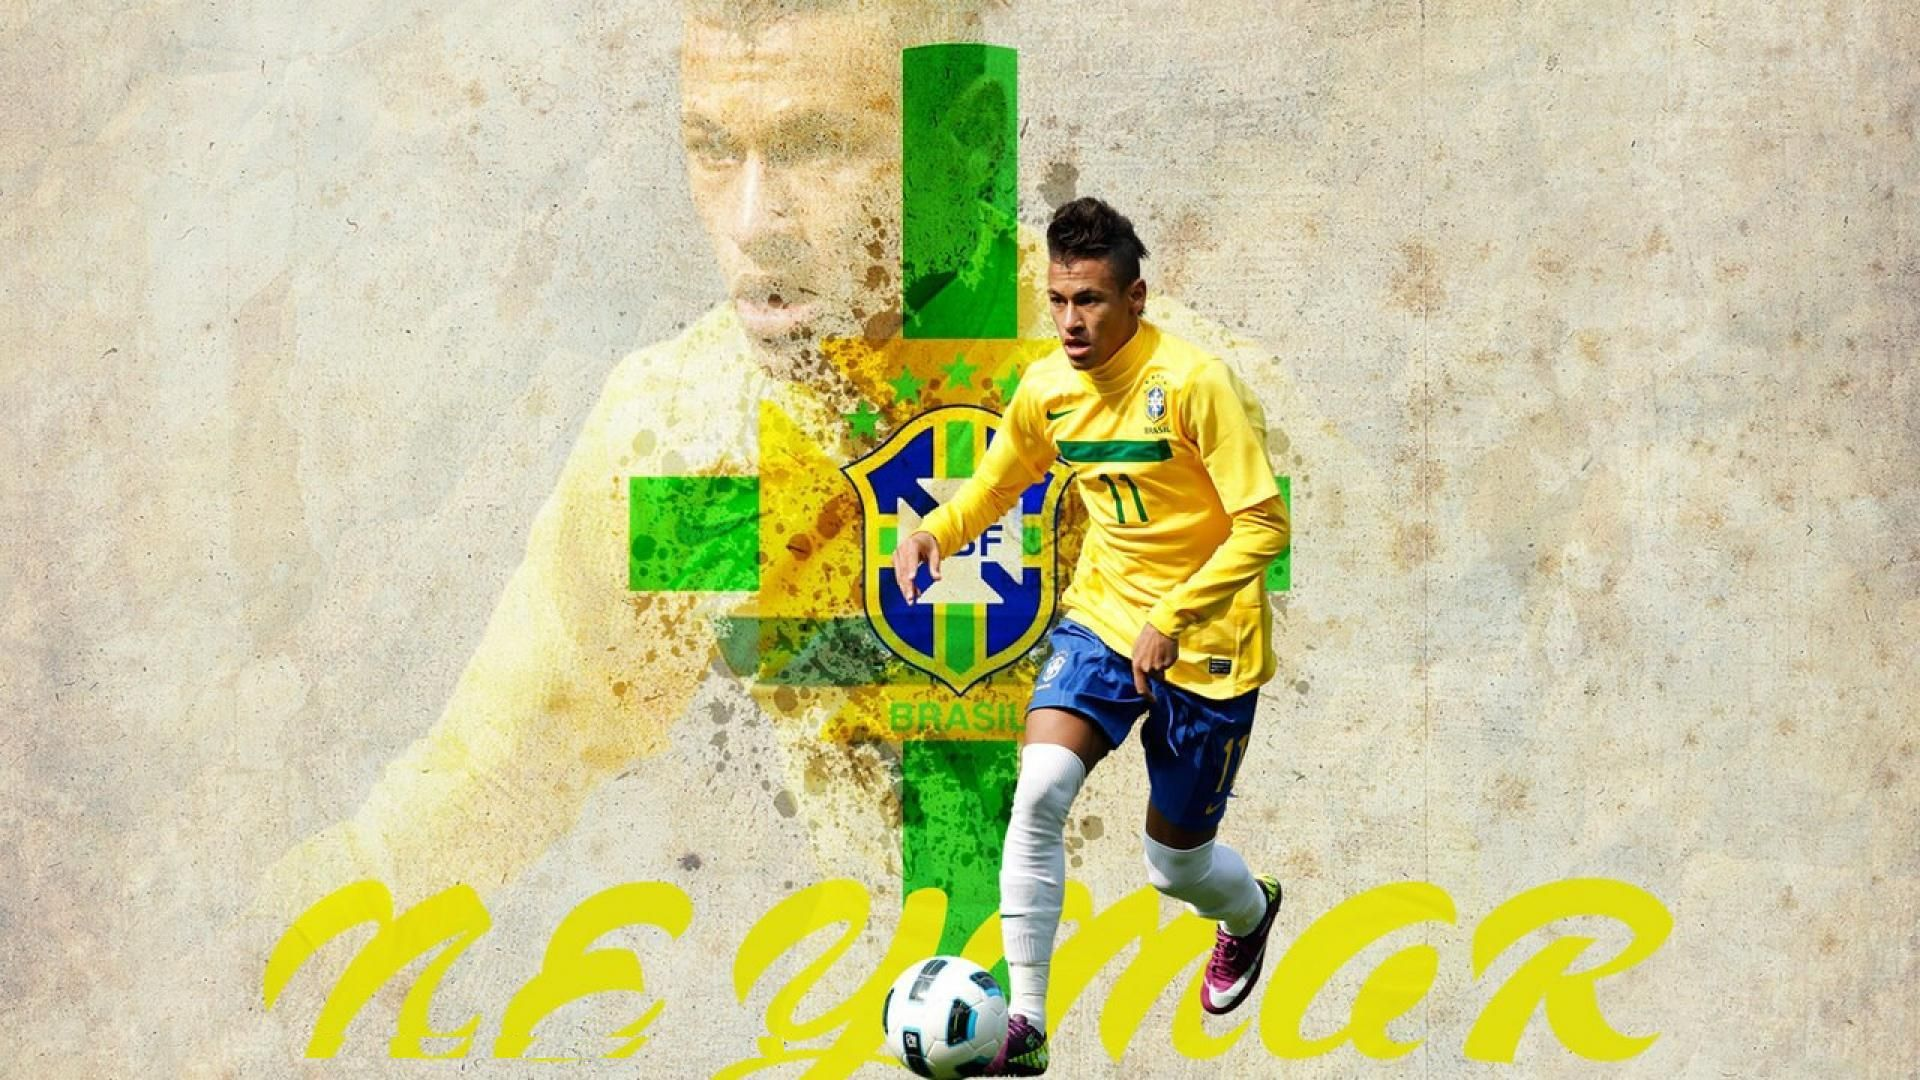 neymar jr.   !lustrΔçõ϶s   pinterest   neymar jr